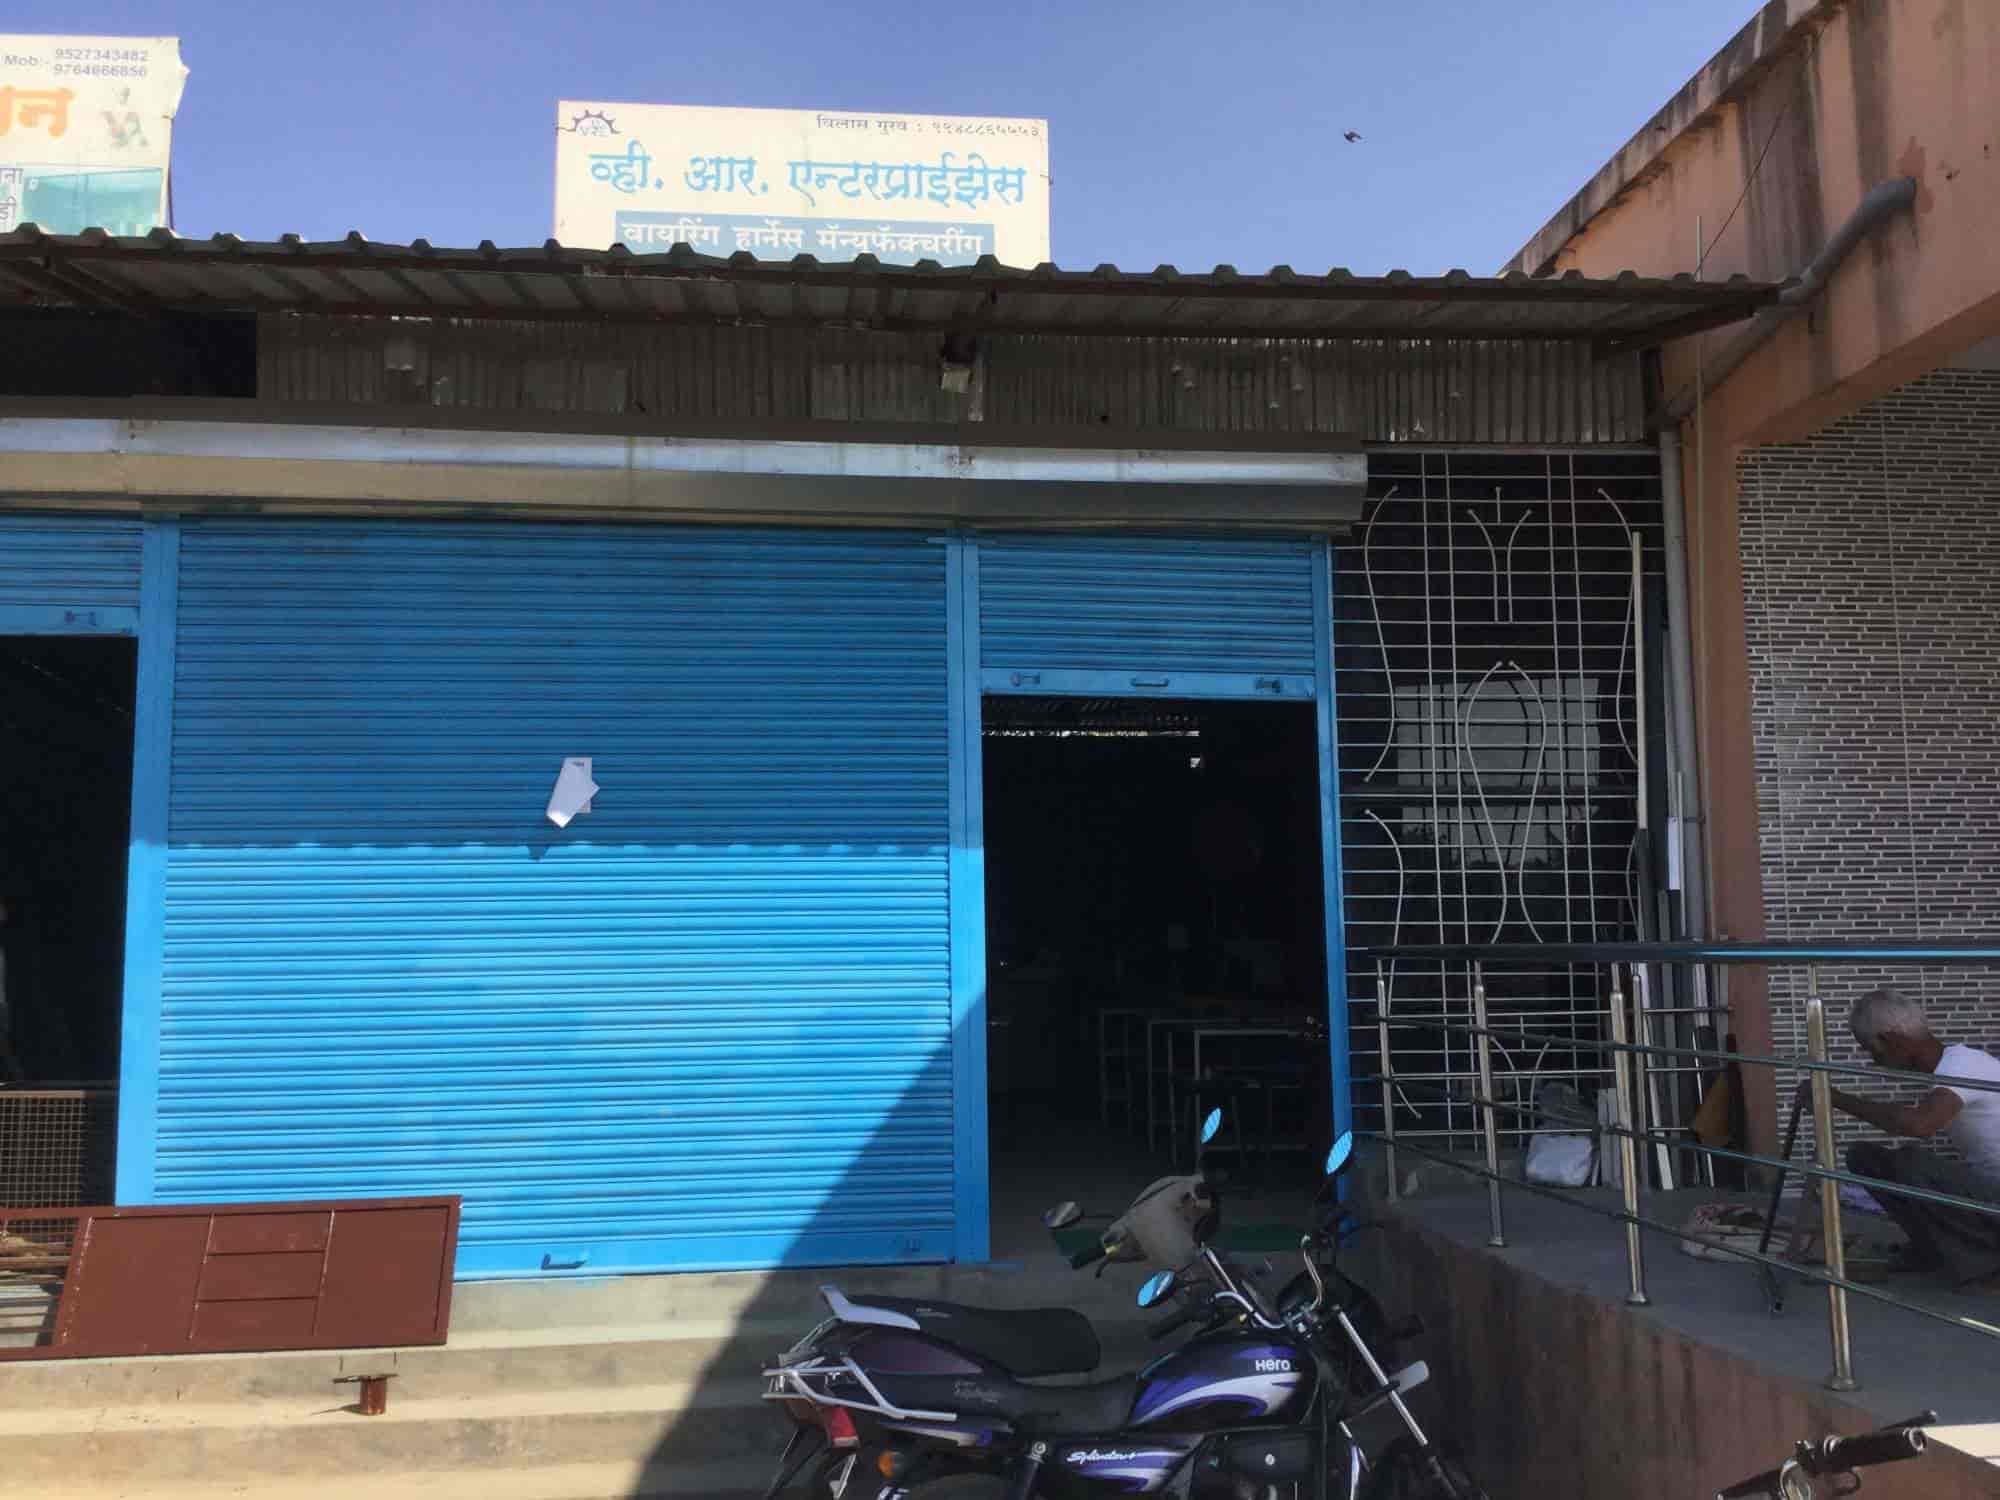 V.r Enterprises, Wadmukhwadi - Electrical Wiring Harness Manufacturers-Minda  in Pune - Justdial